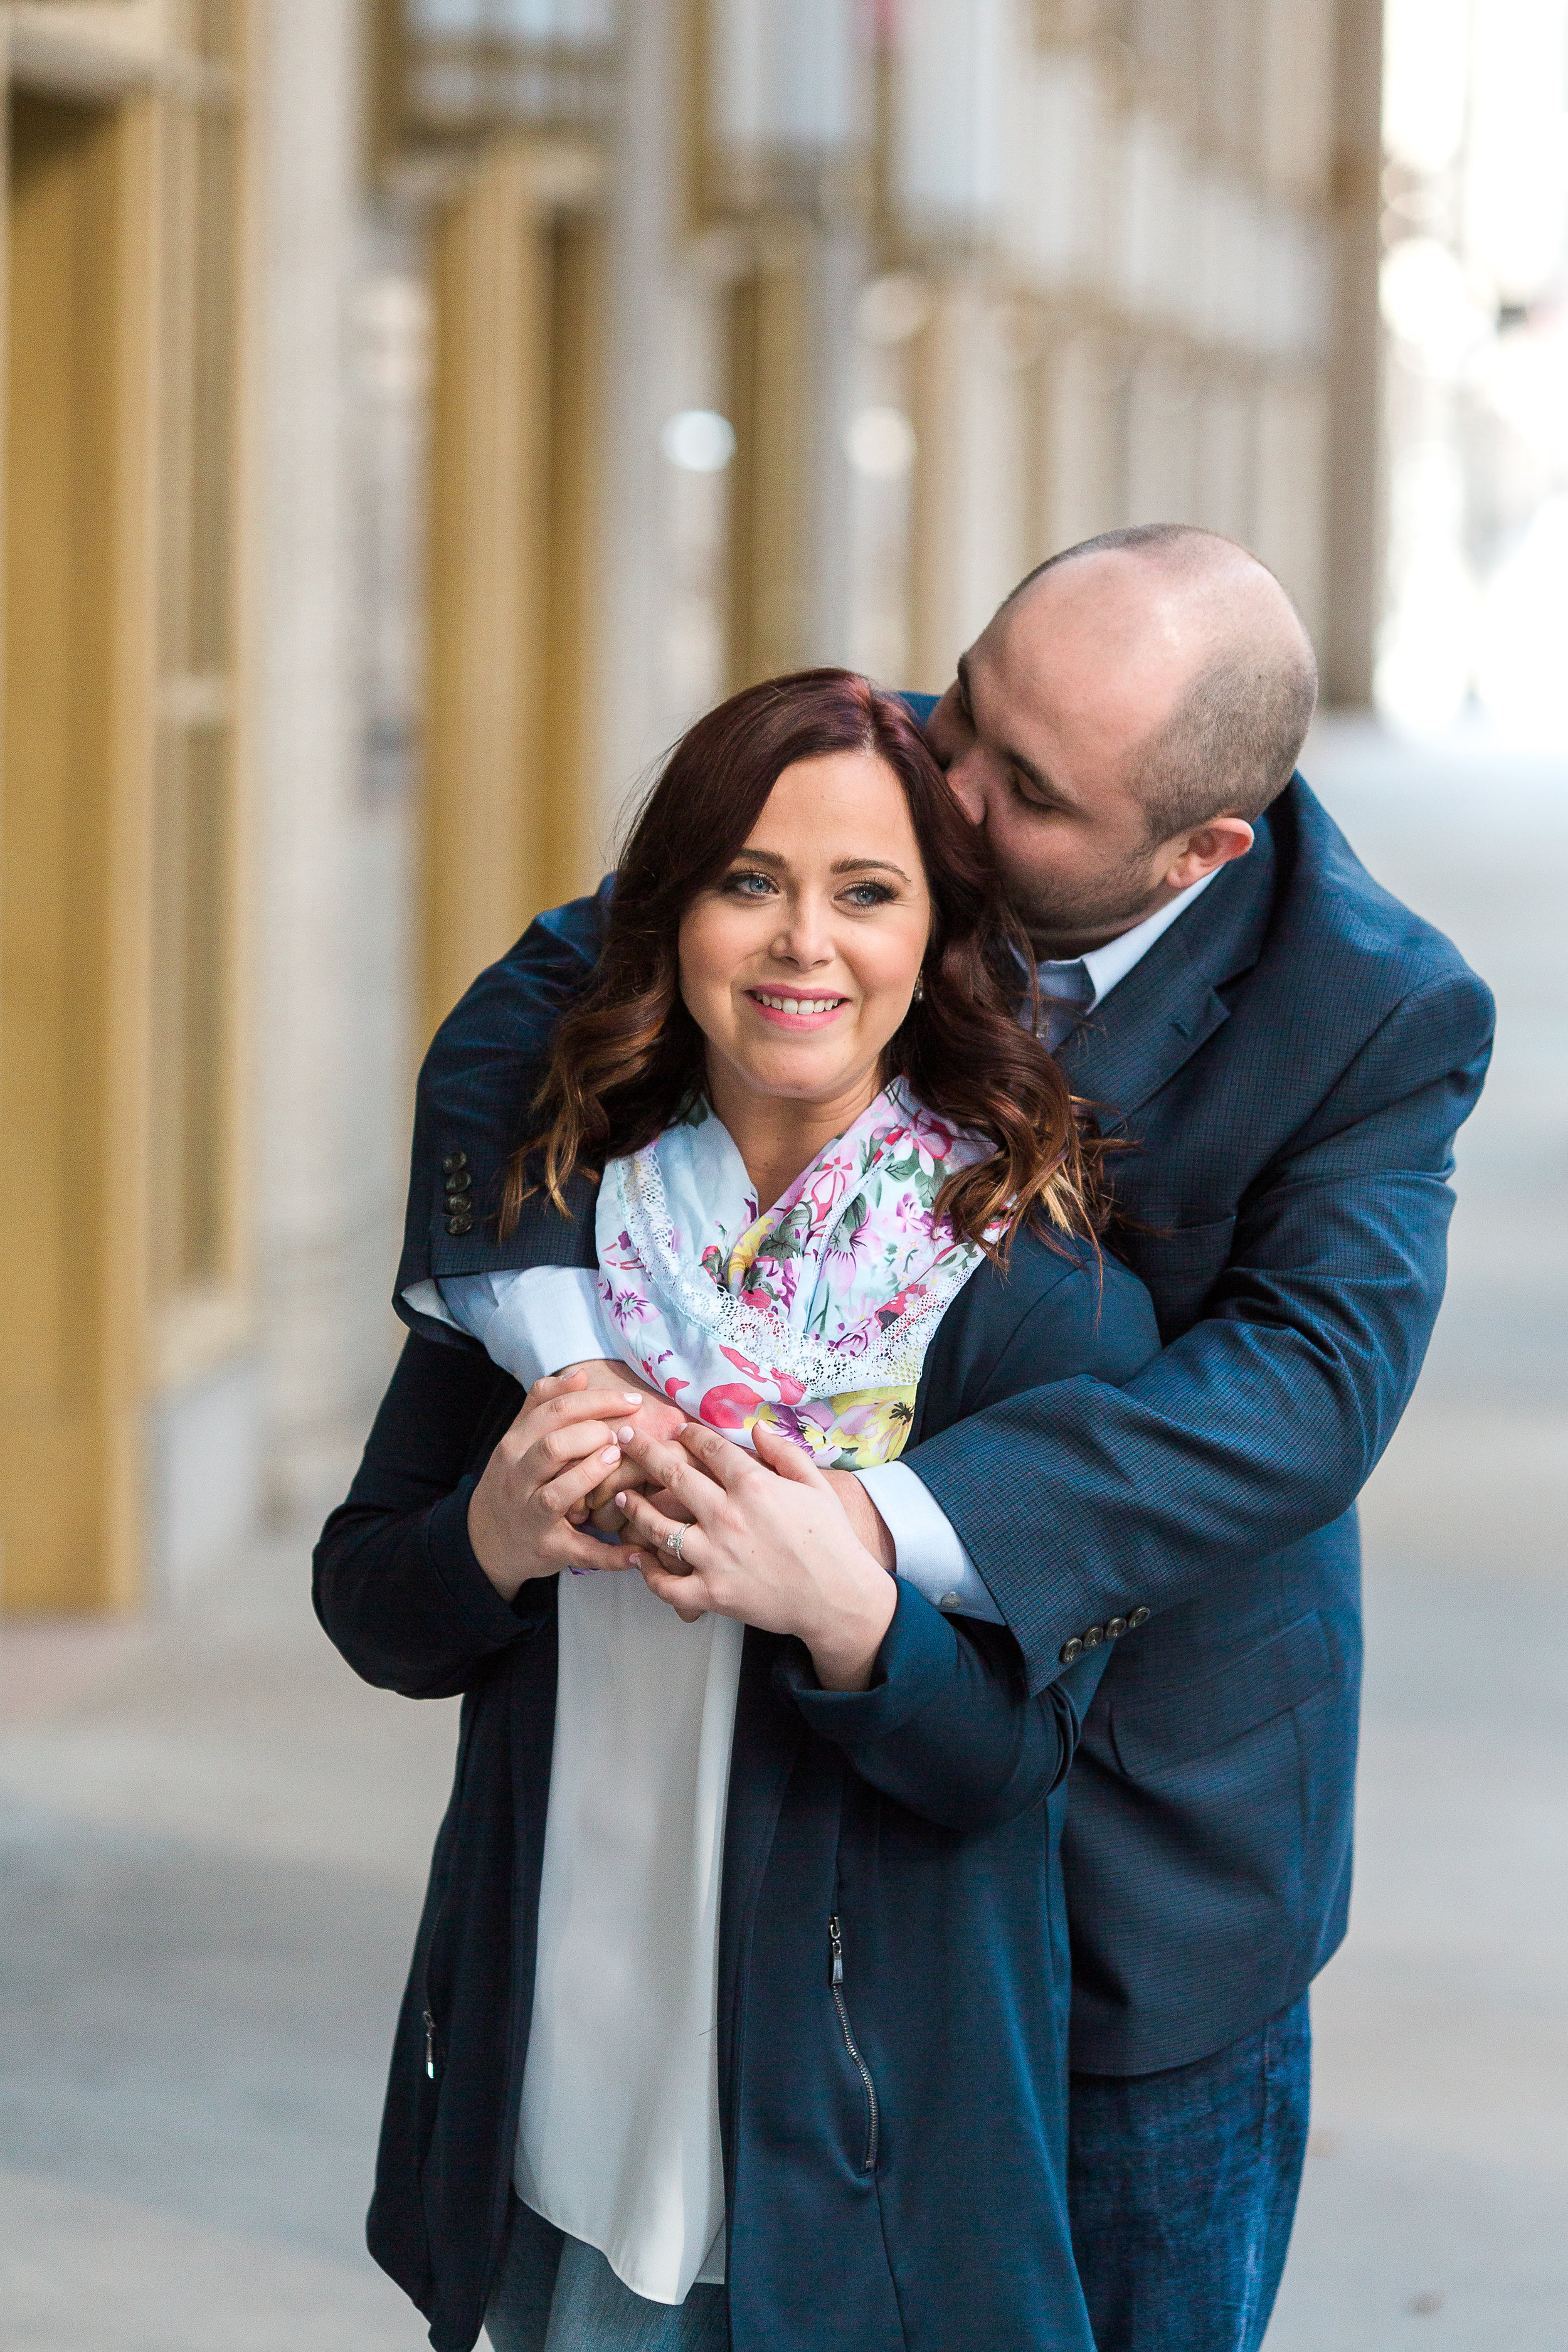 chicago-engagement-photographer-classy-olive-park-downtown-wedding-kristen-cloyd-40.jpg